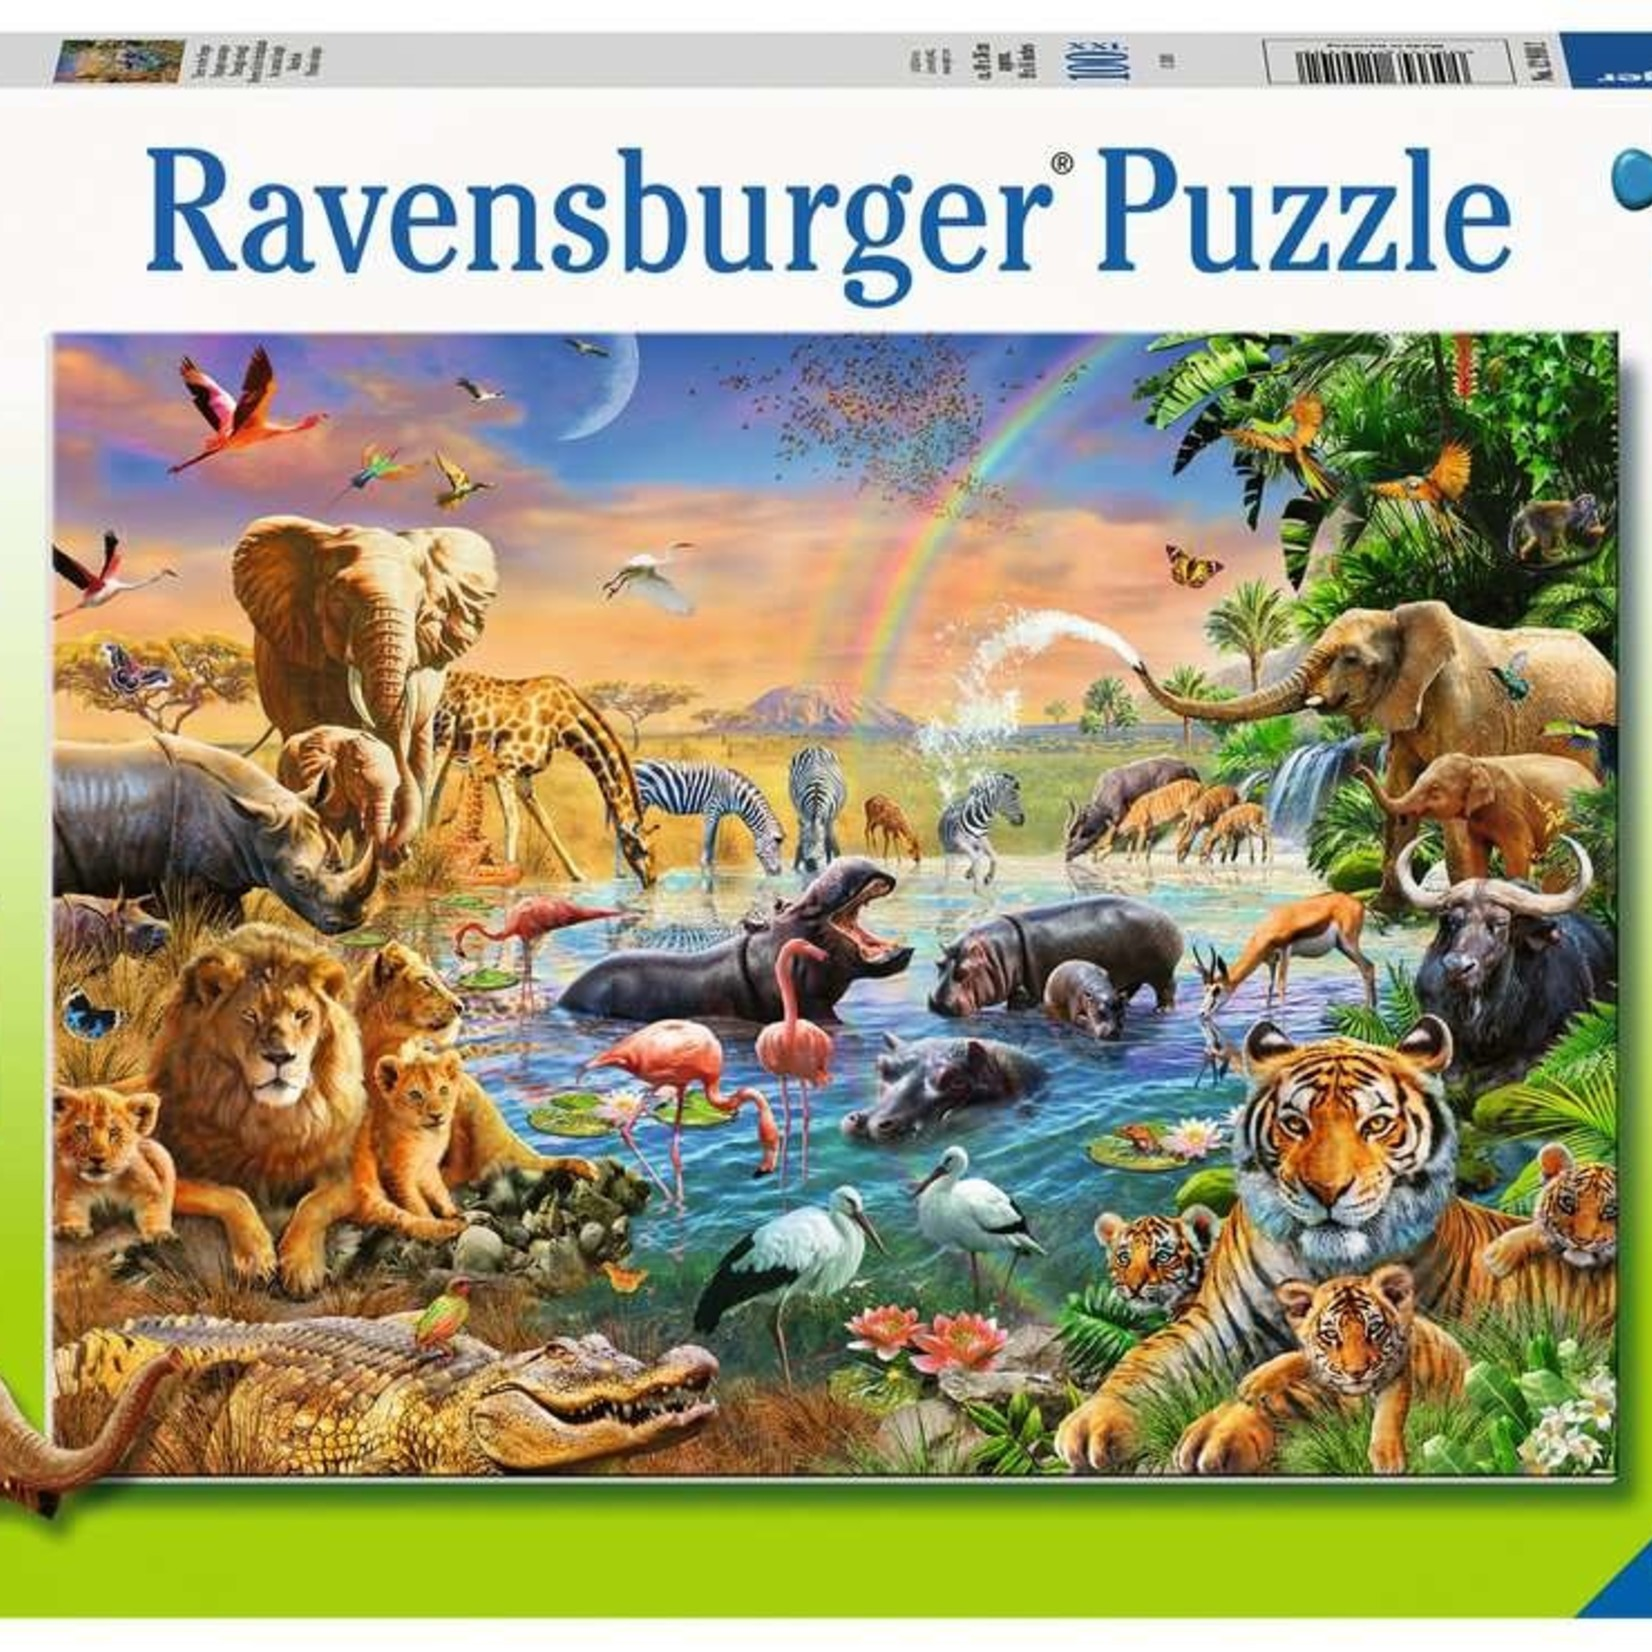 Ravensburger Savannah Jungle Waterhole - 100 pc